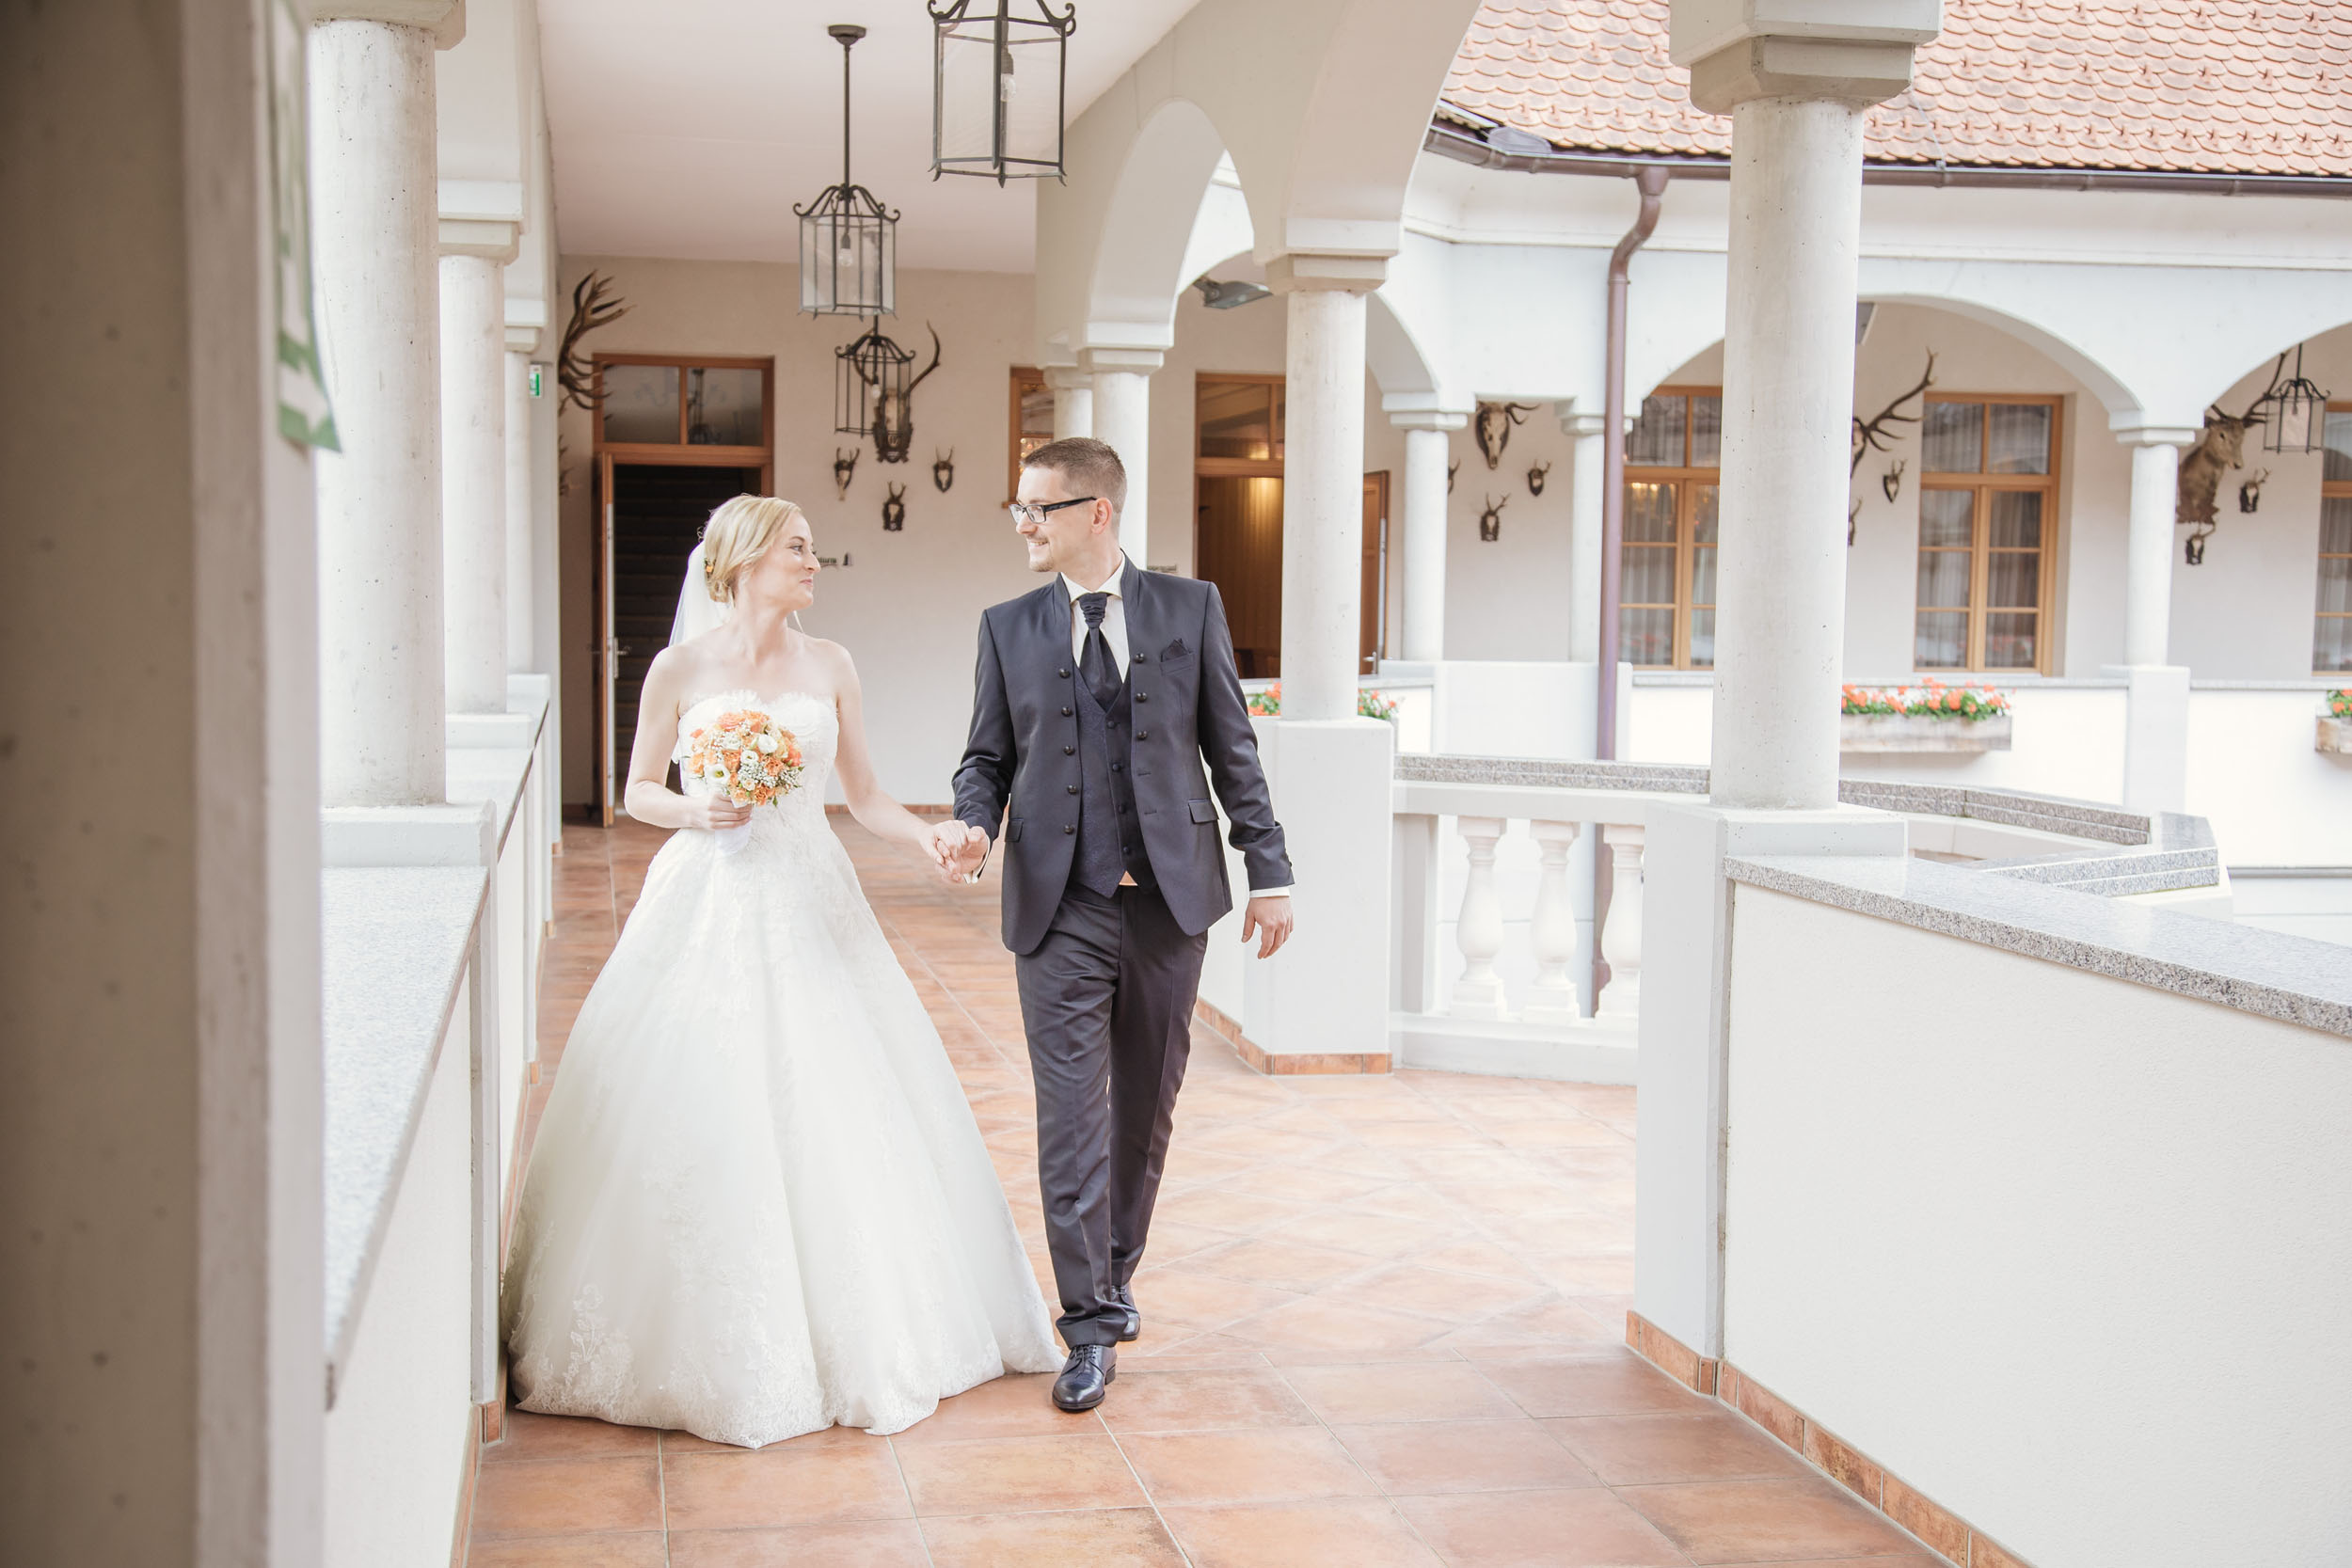 Christine & Robert - Hochzeit im Weinschloss